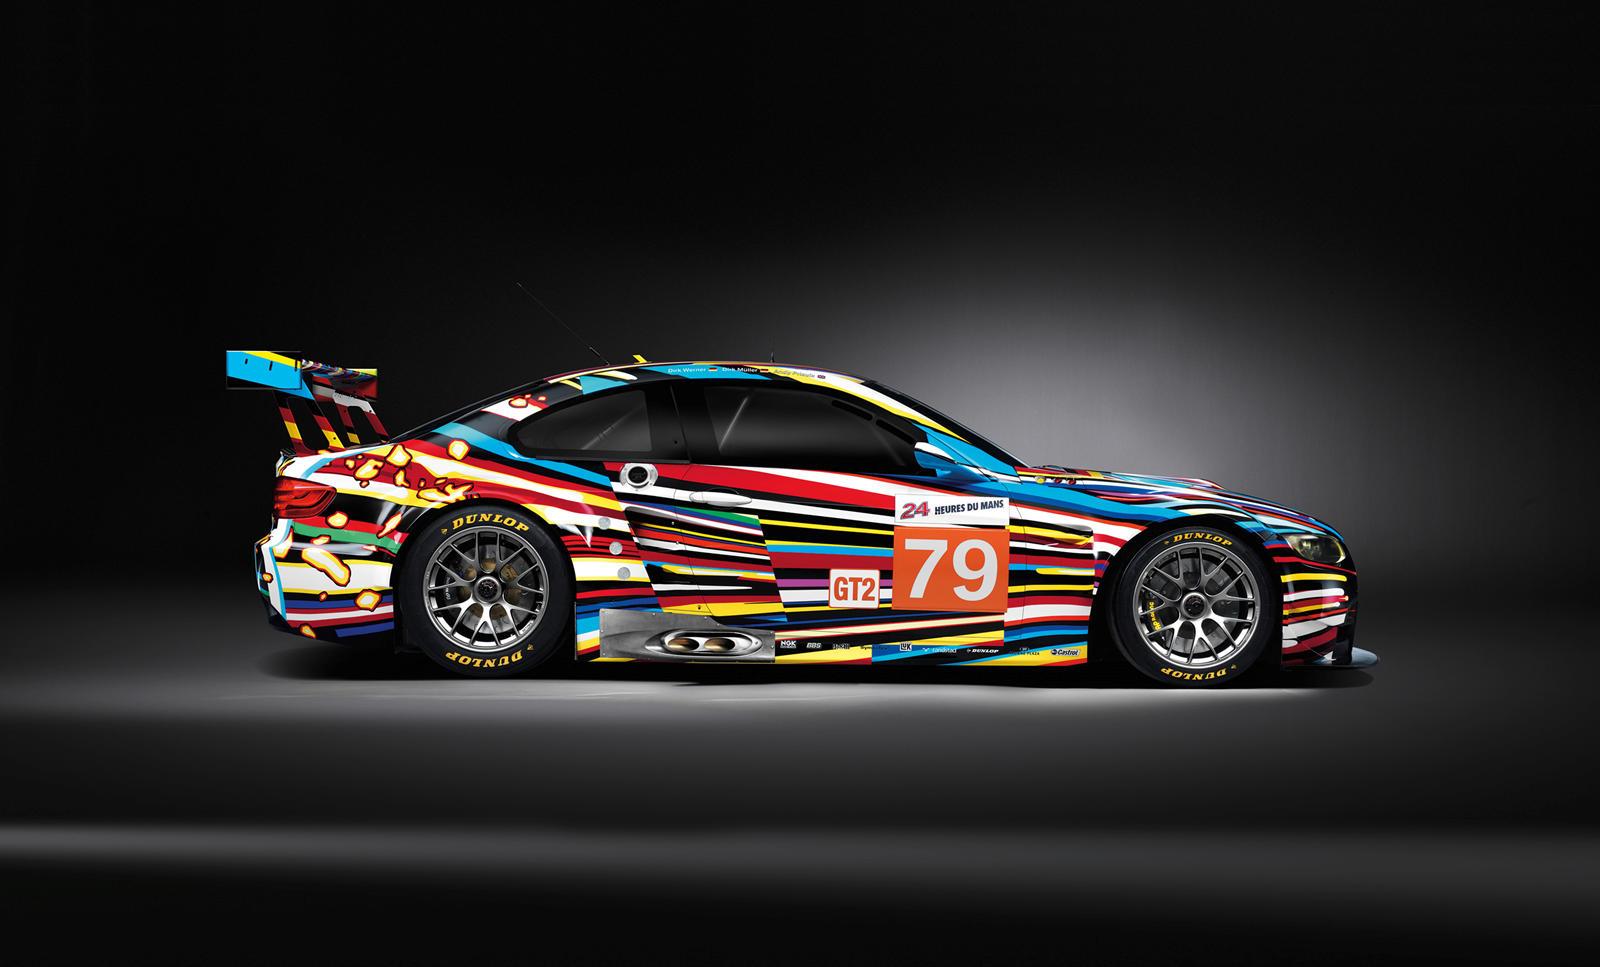 84461 NY Graffiti Artist To Design BMW's Newest Art Cars